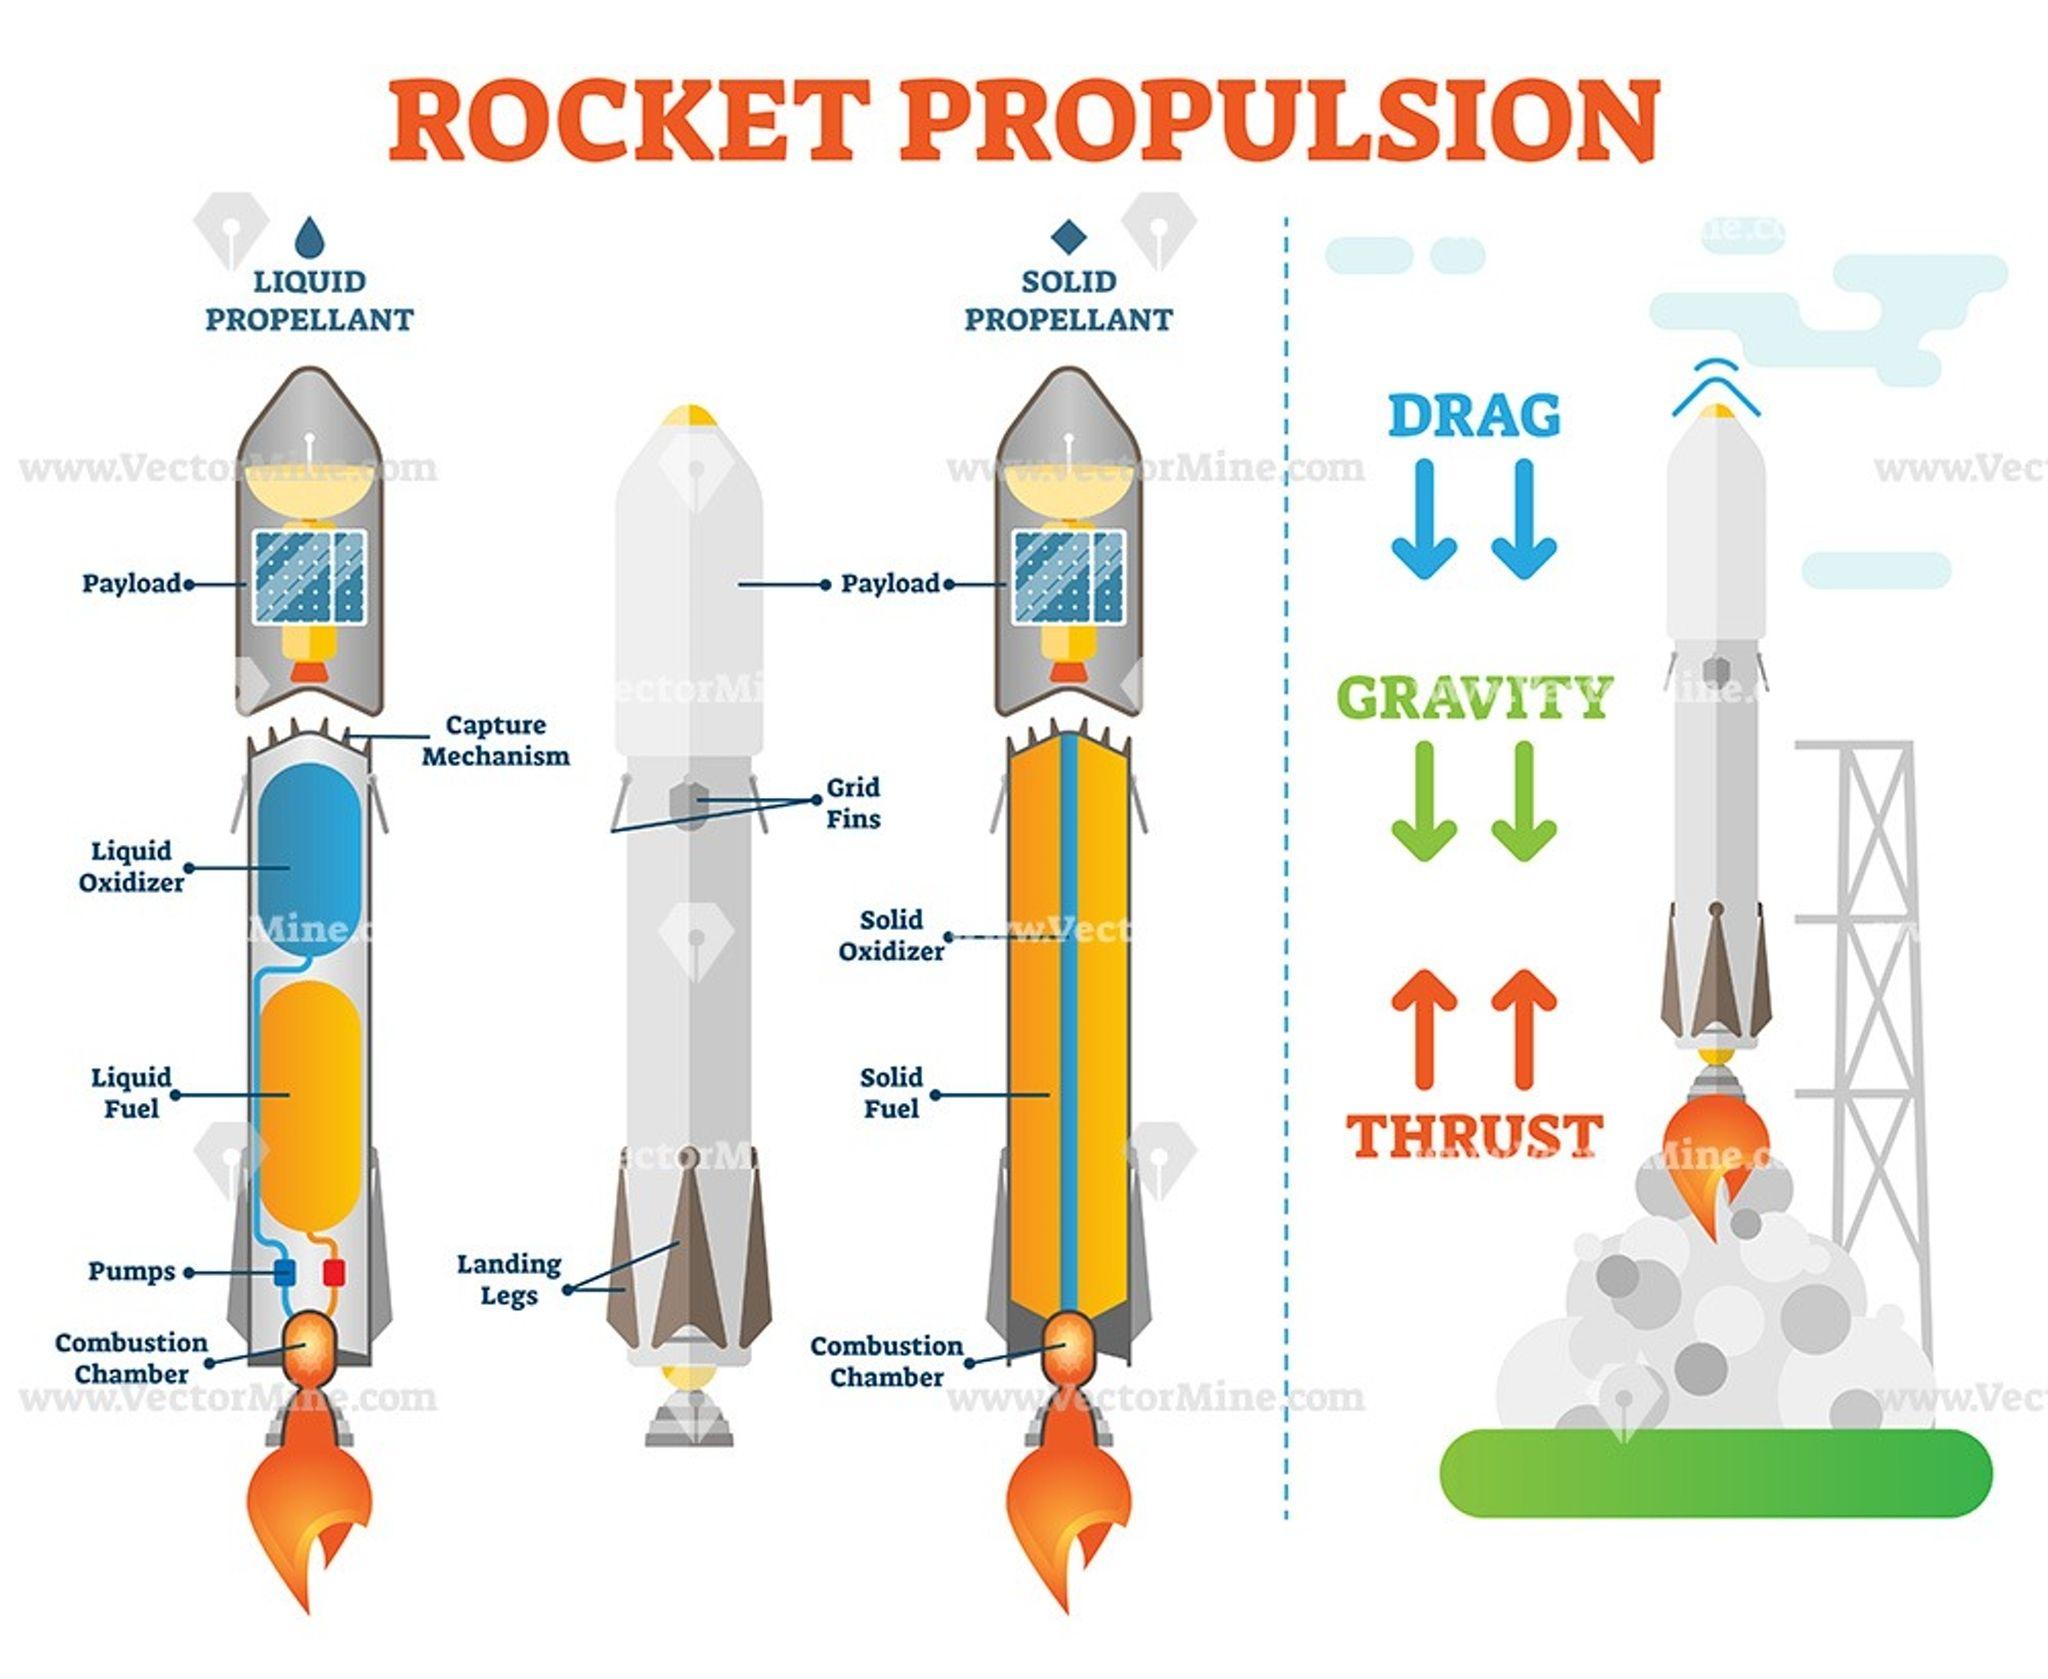 Rocket Propulsion Space Engineering Vector Illustration Diagram Rocket Engine Rocket Space Shuttle